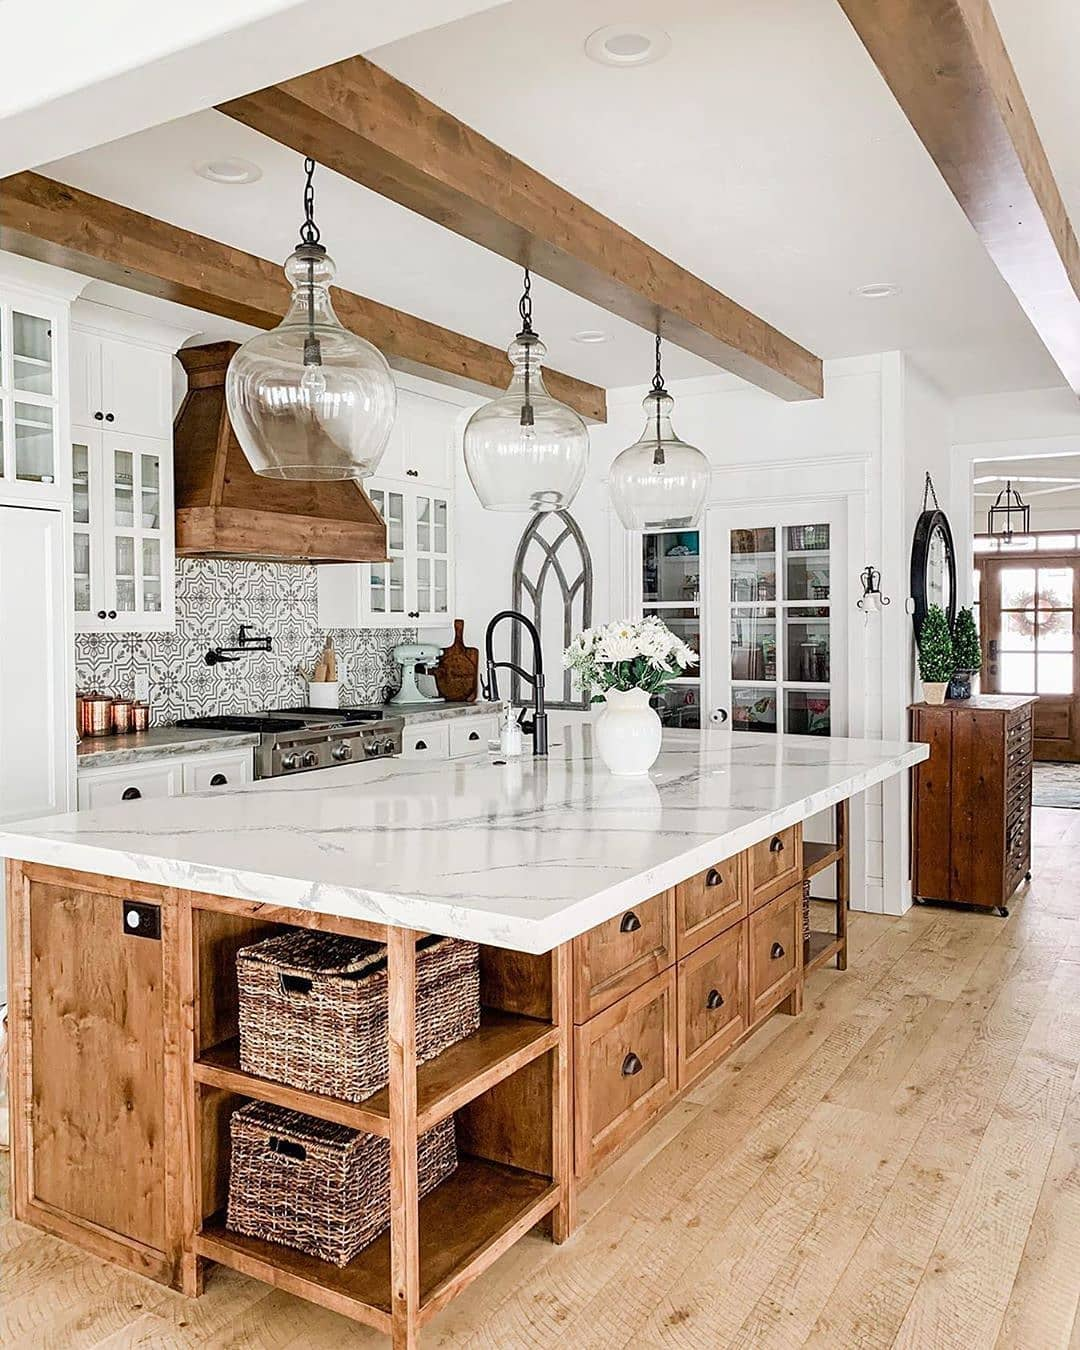 Best Farmhouse Kitchen Ideas Board And Batten Siding Blog